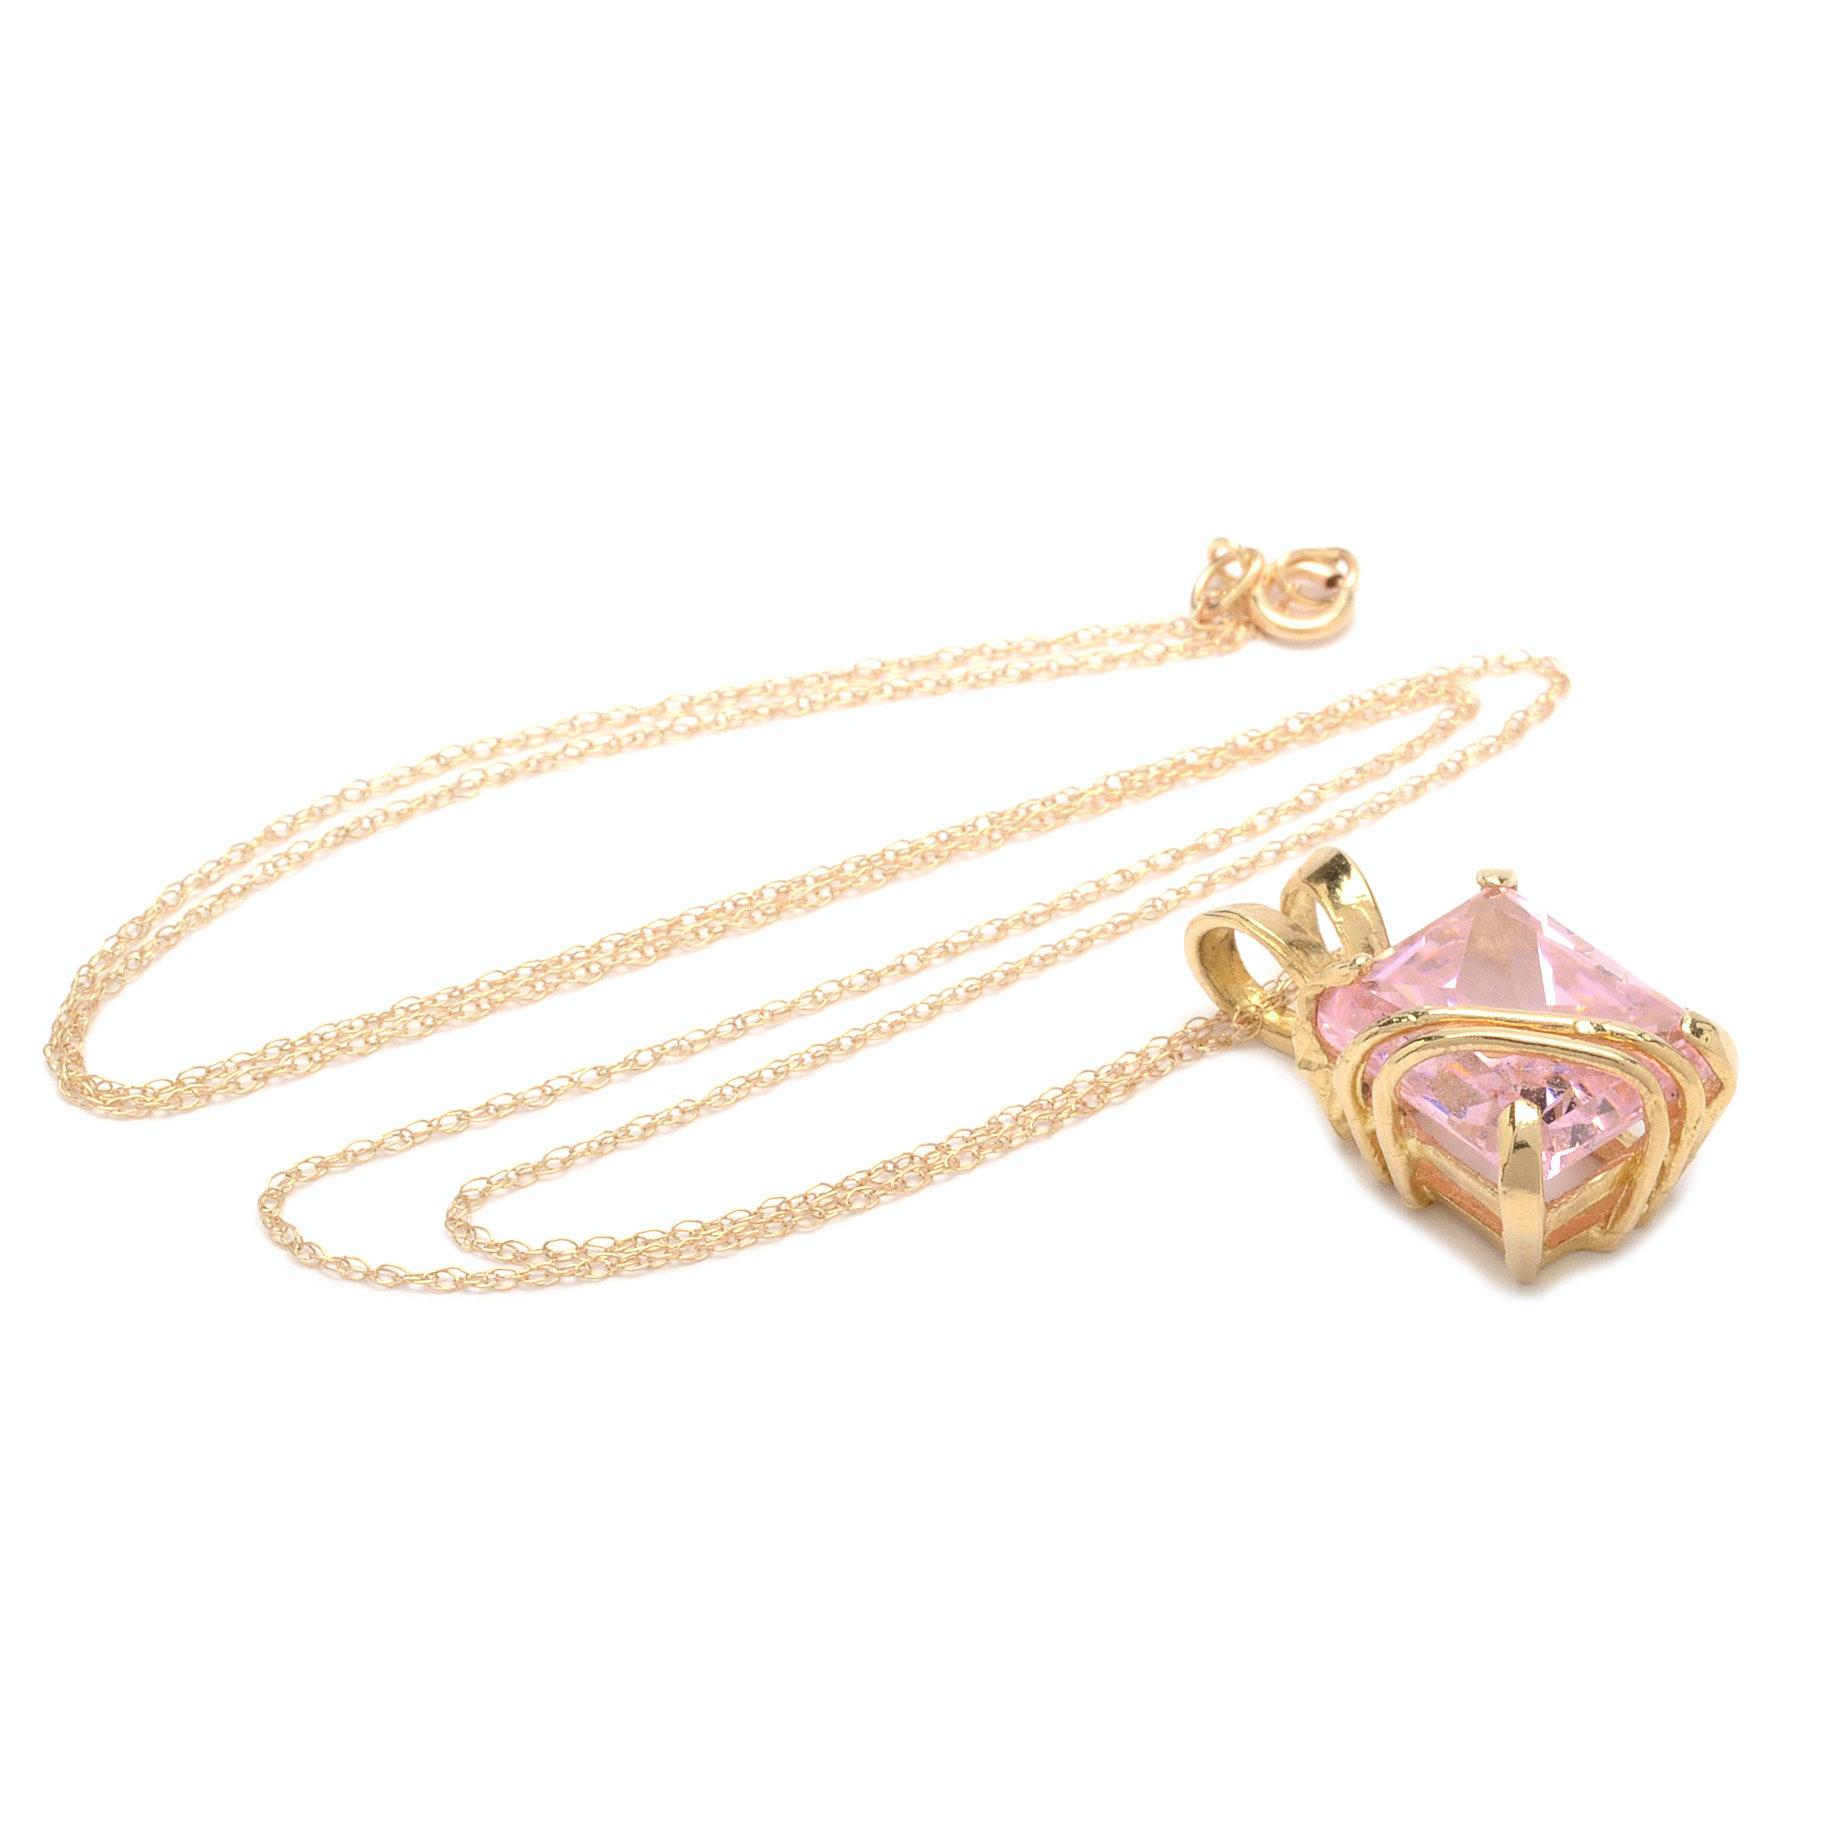 10K 14K Yellow Gold Cubic Zirconia Pendant Necklace